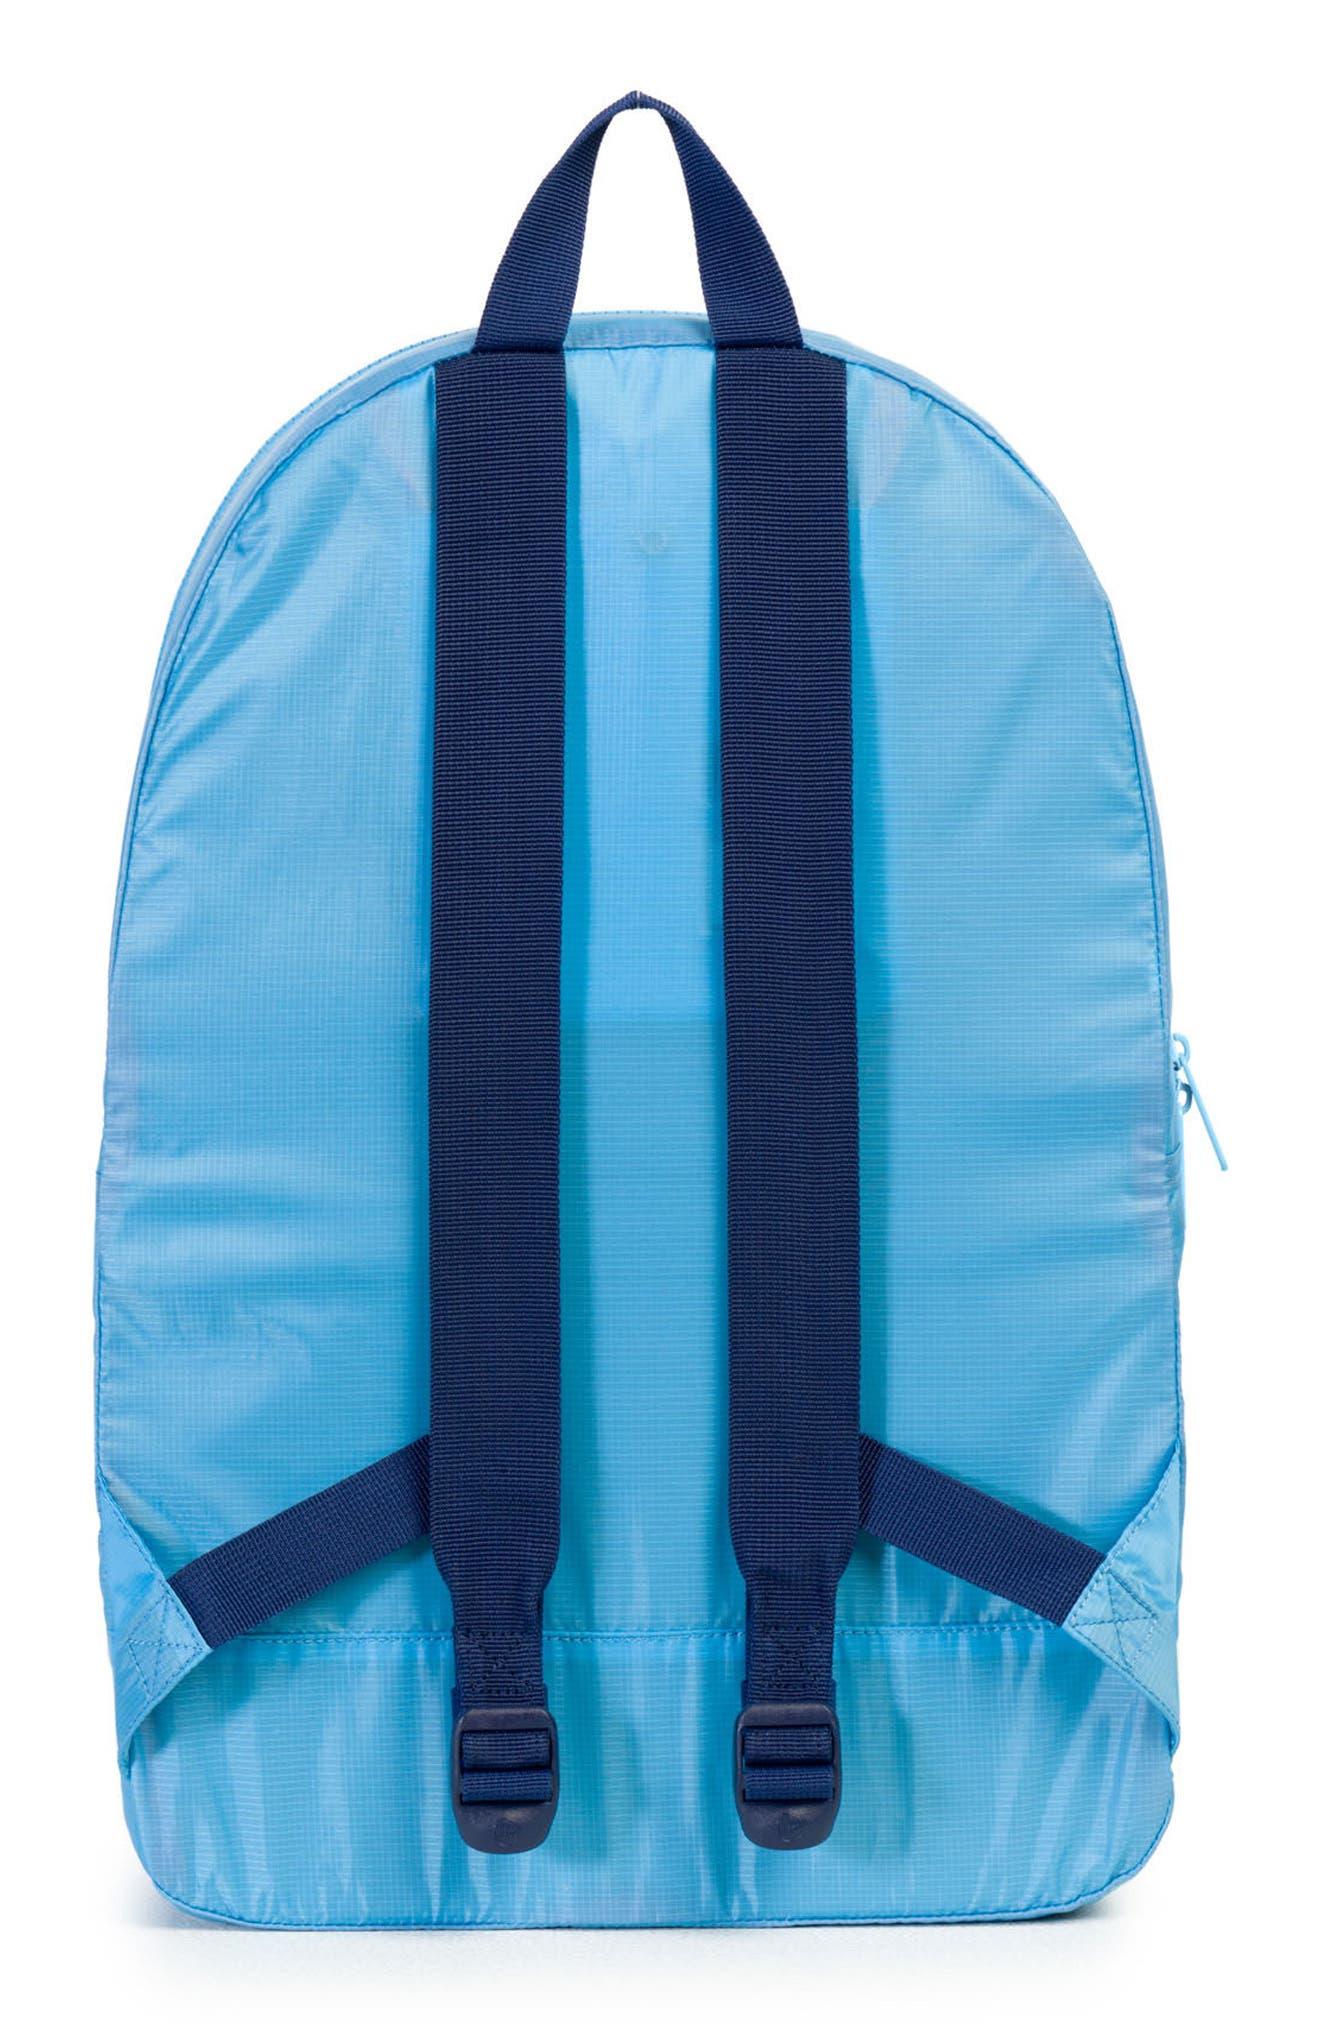 Packable - MLB American League Backpack,                             Alternate thumbnail 2, color,                             Kansas City Royals